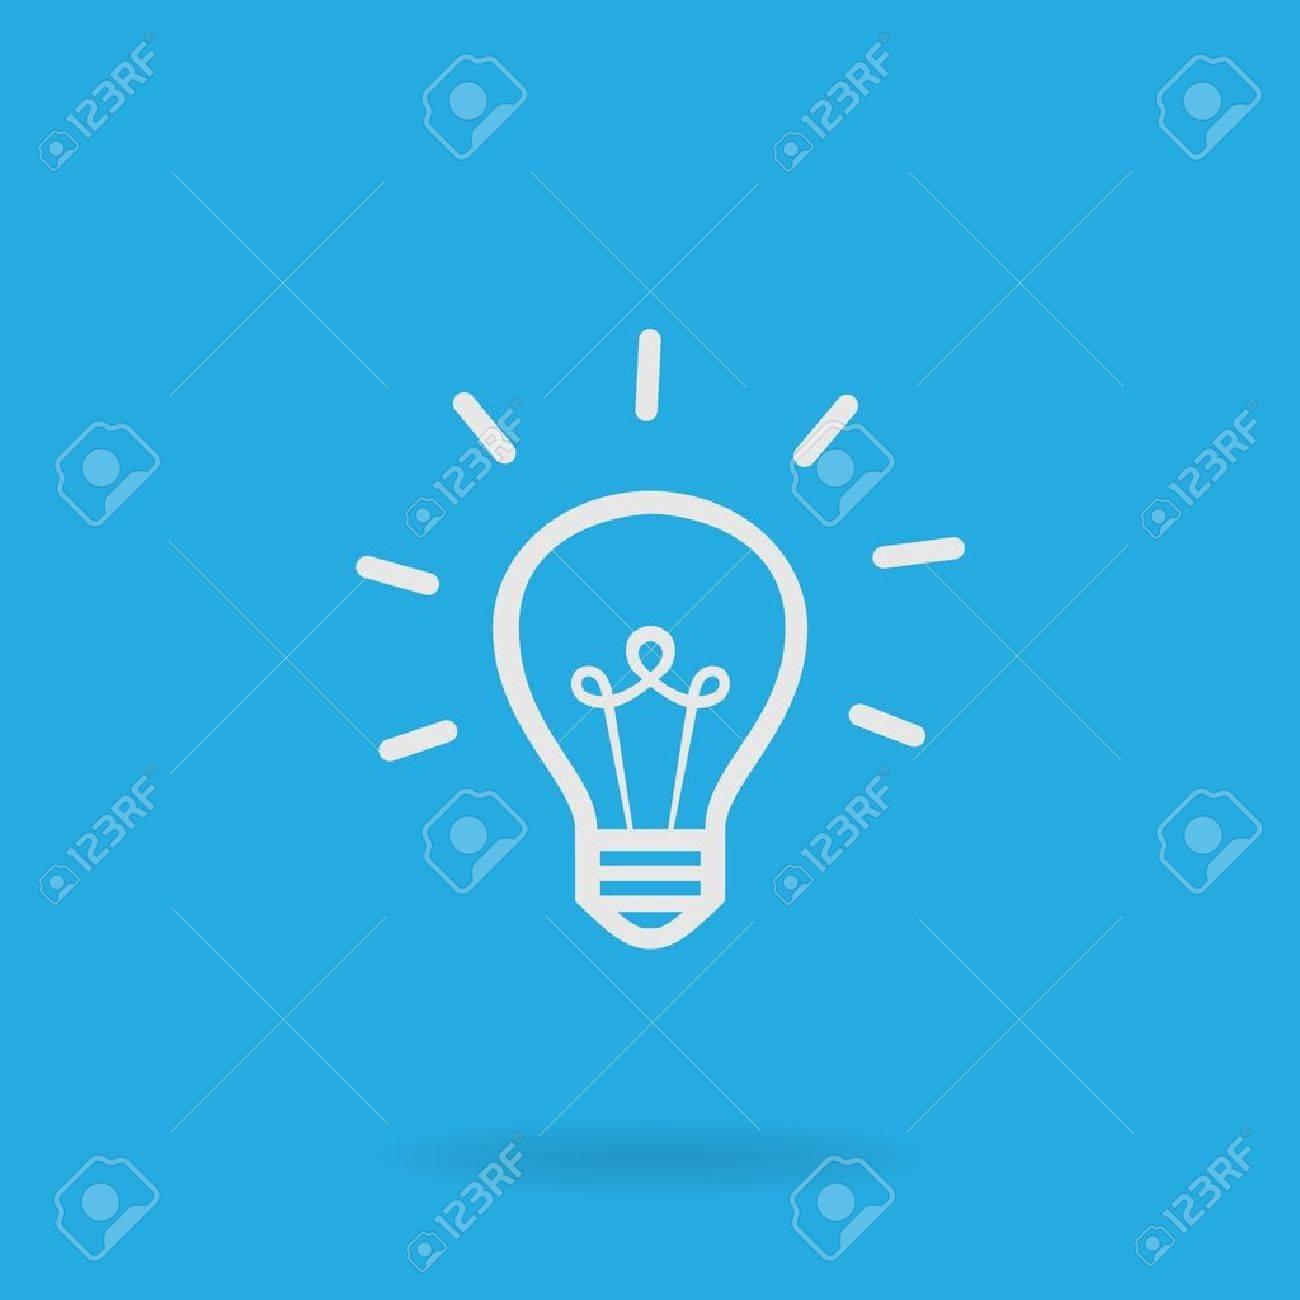 Light bulb icon - 13917068